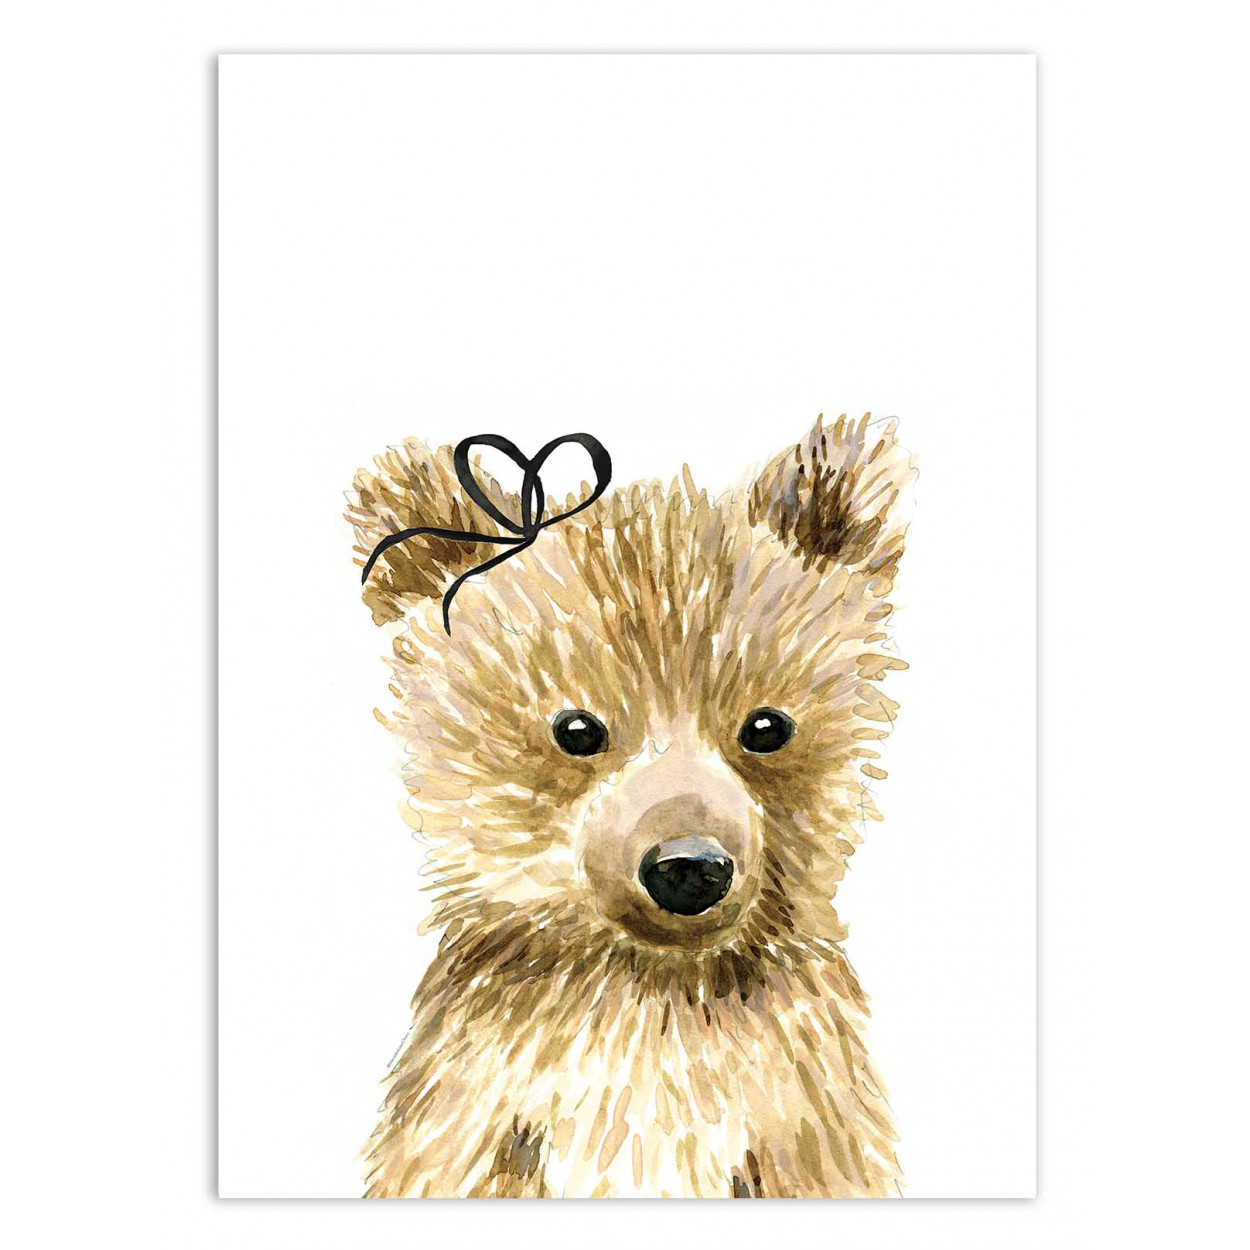 BABY BEAR BOW - MERCEDES LOPEZ CHARRO -  Affiche d'art 50 x 70 cm